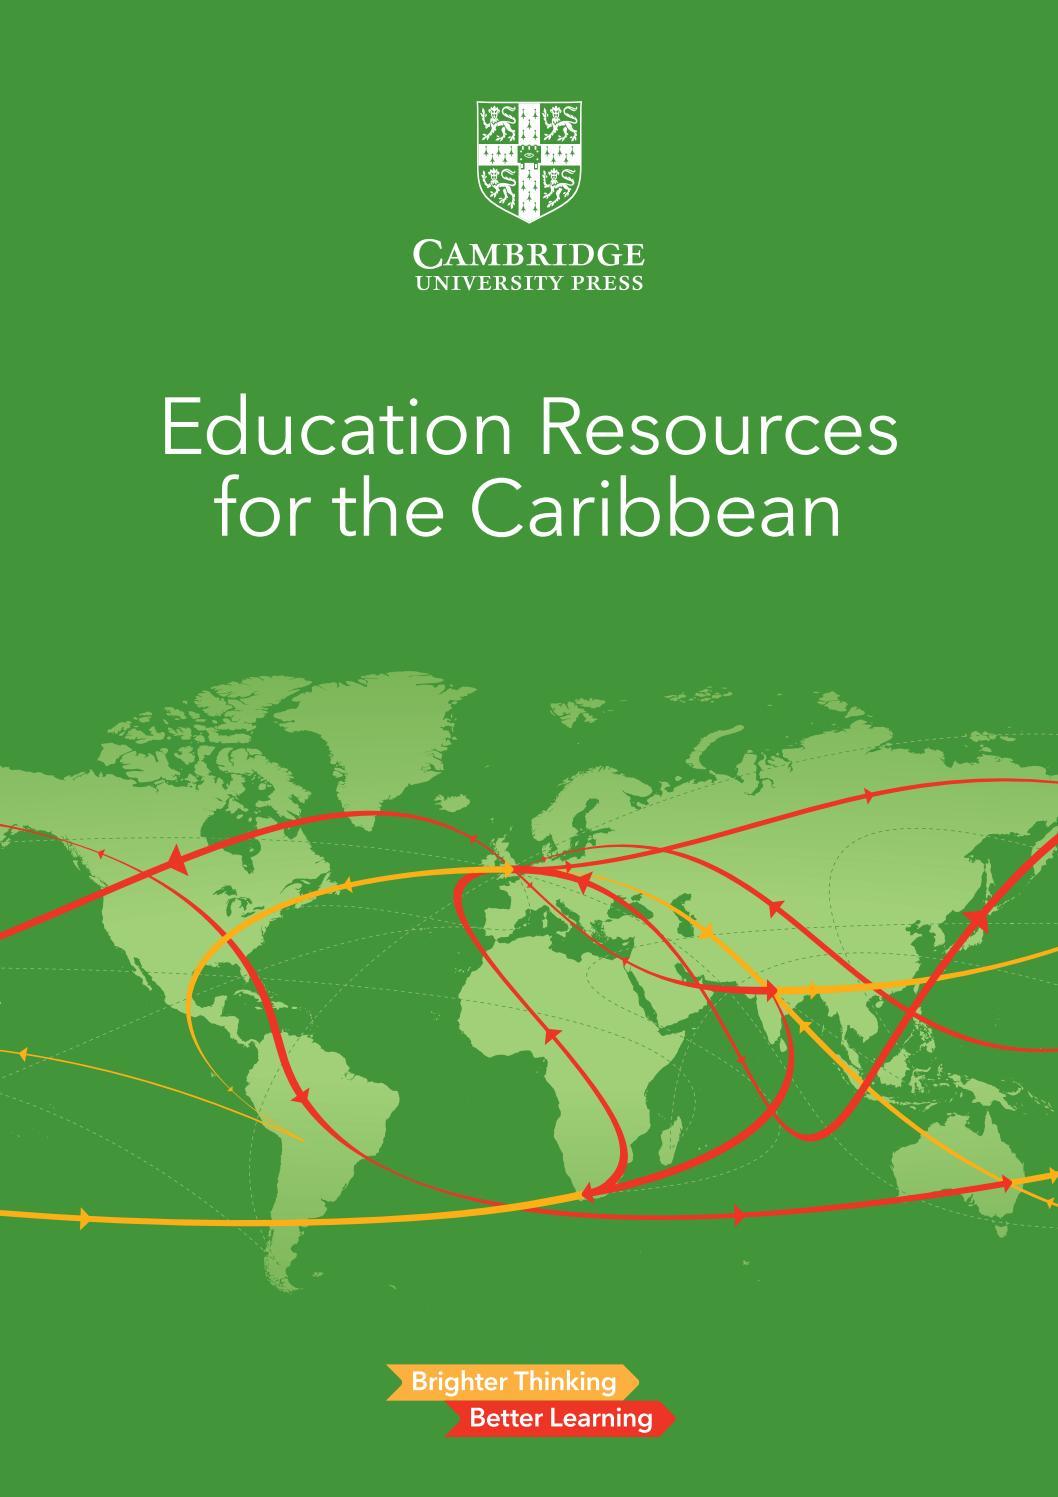 Caribbean Catalogue 2018 By Cambridge University Press